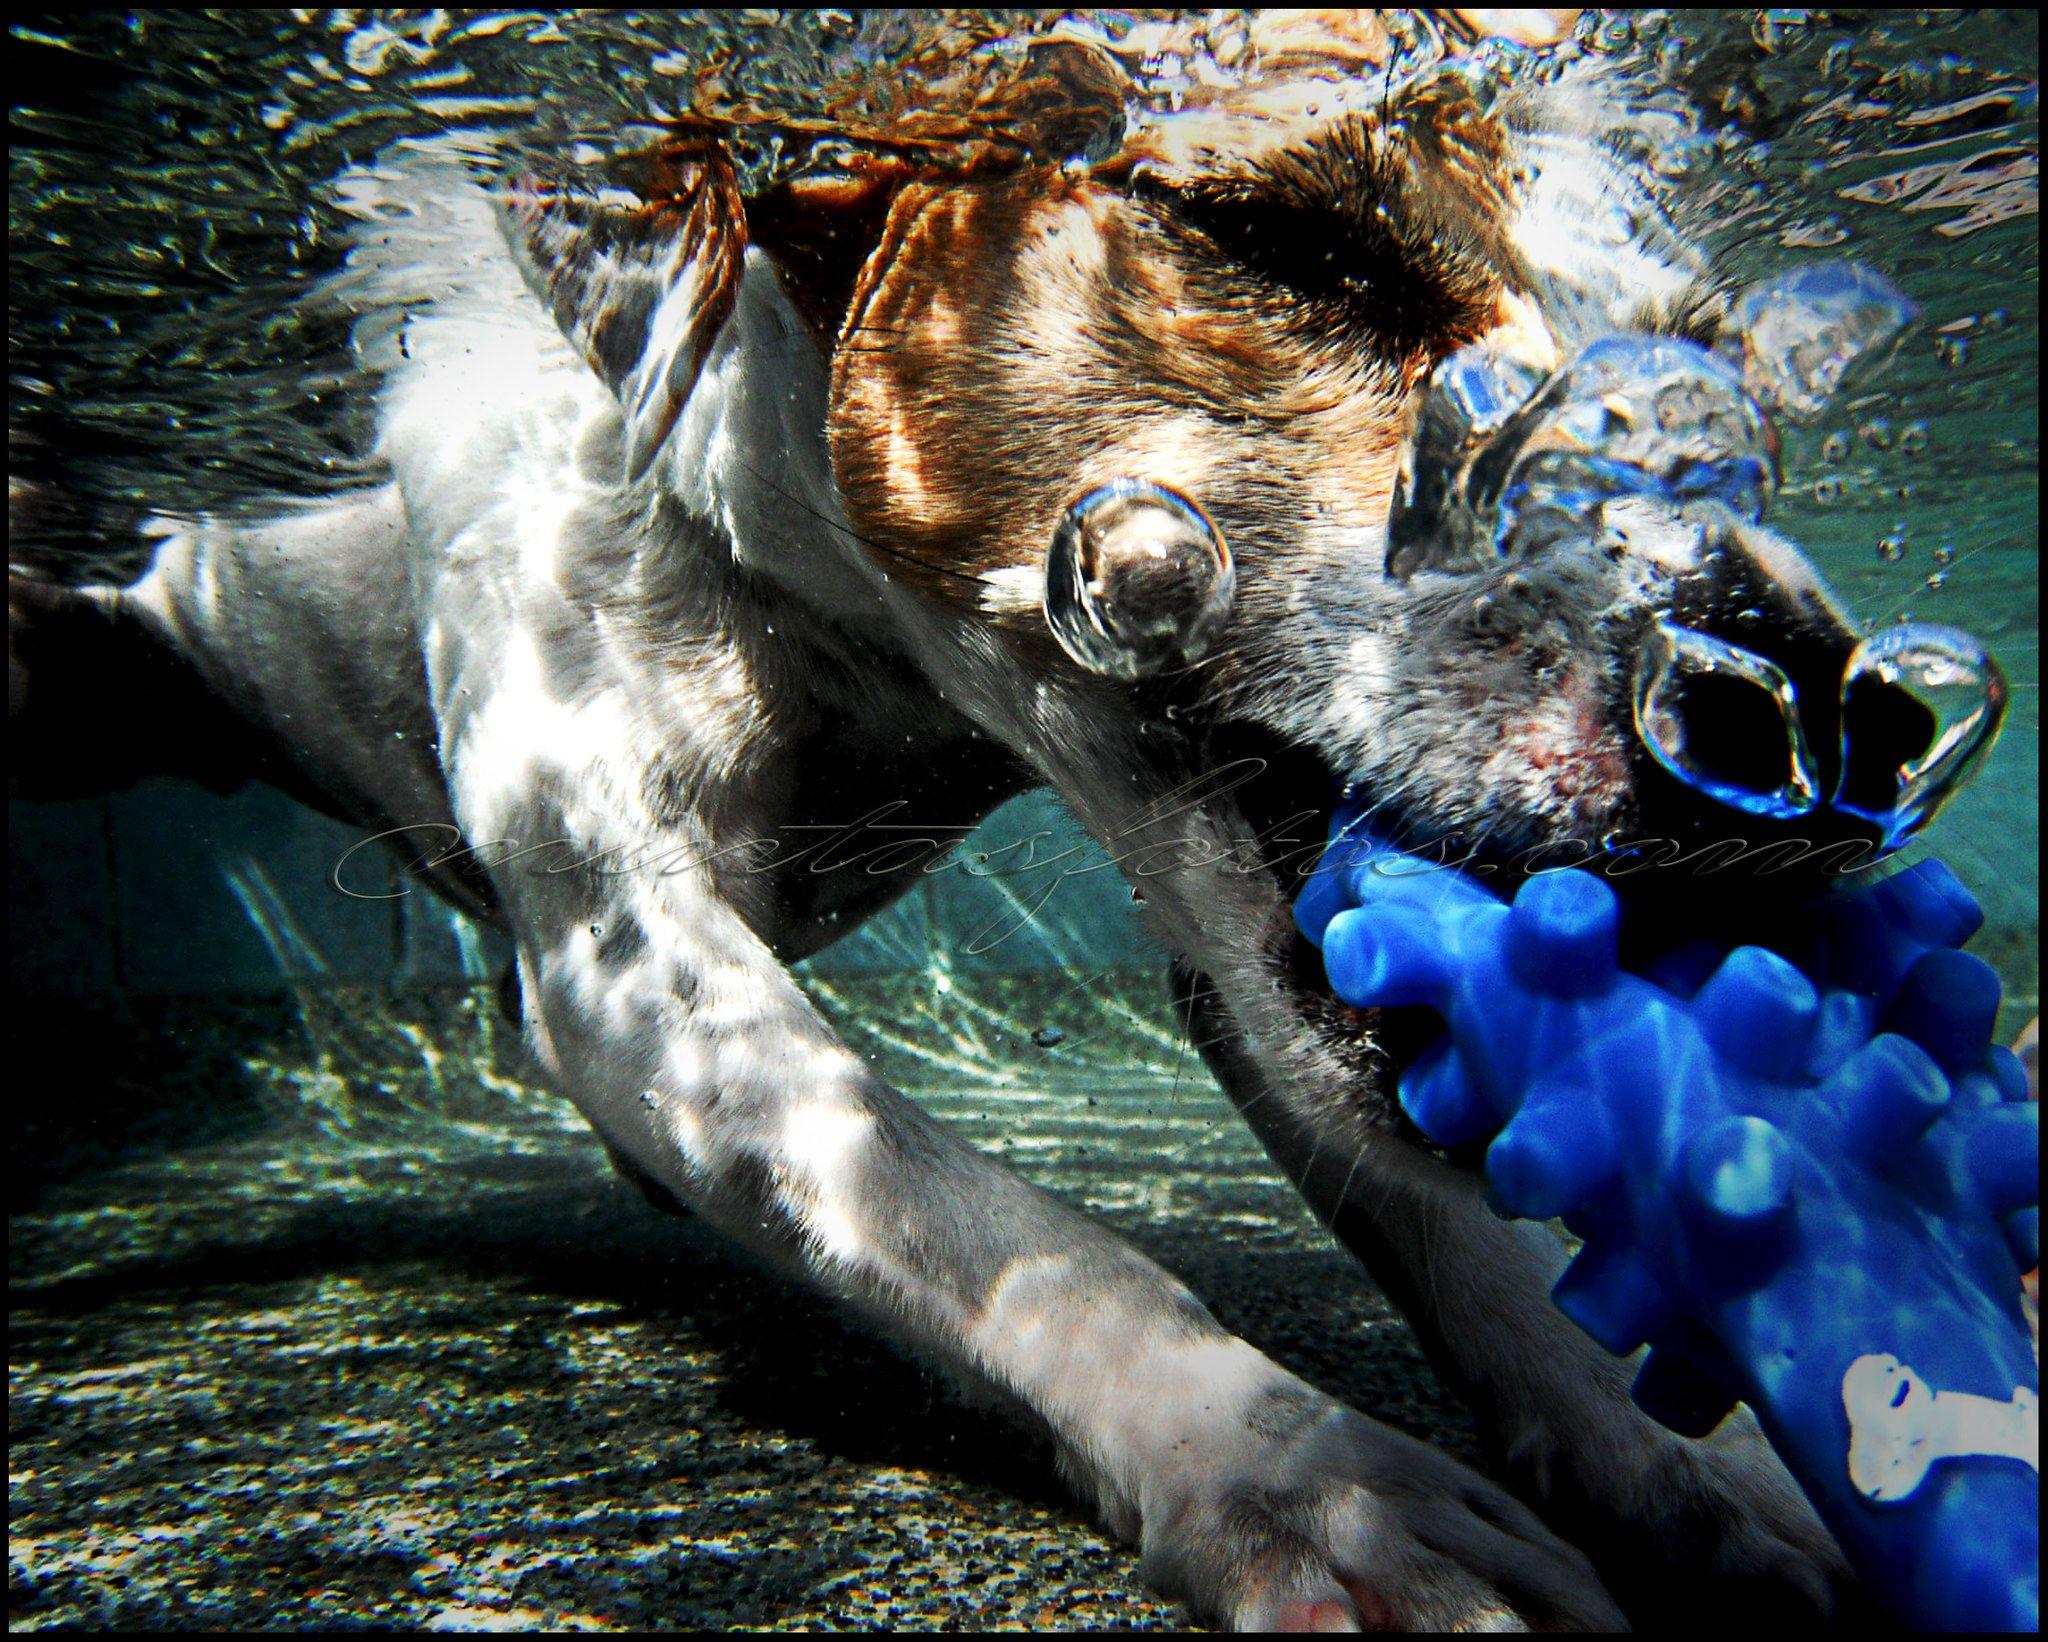 Booboo underwater nose bubbles